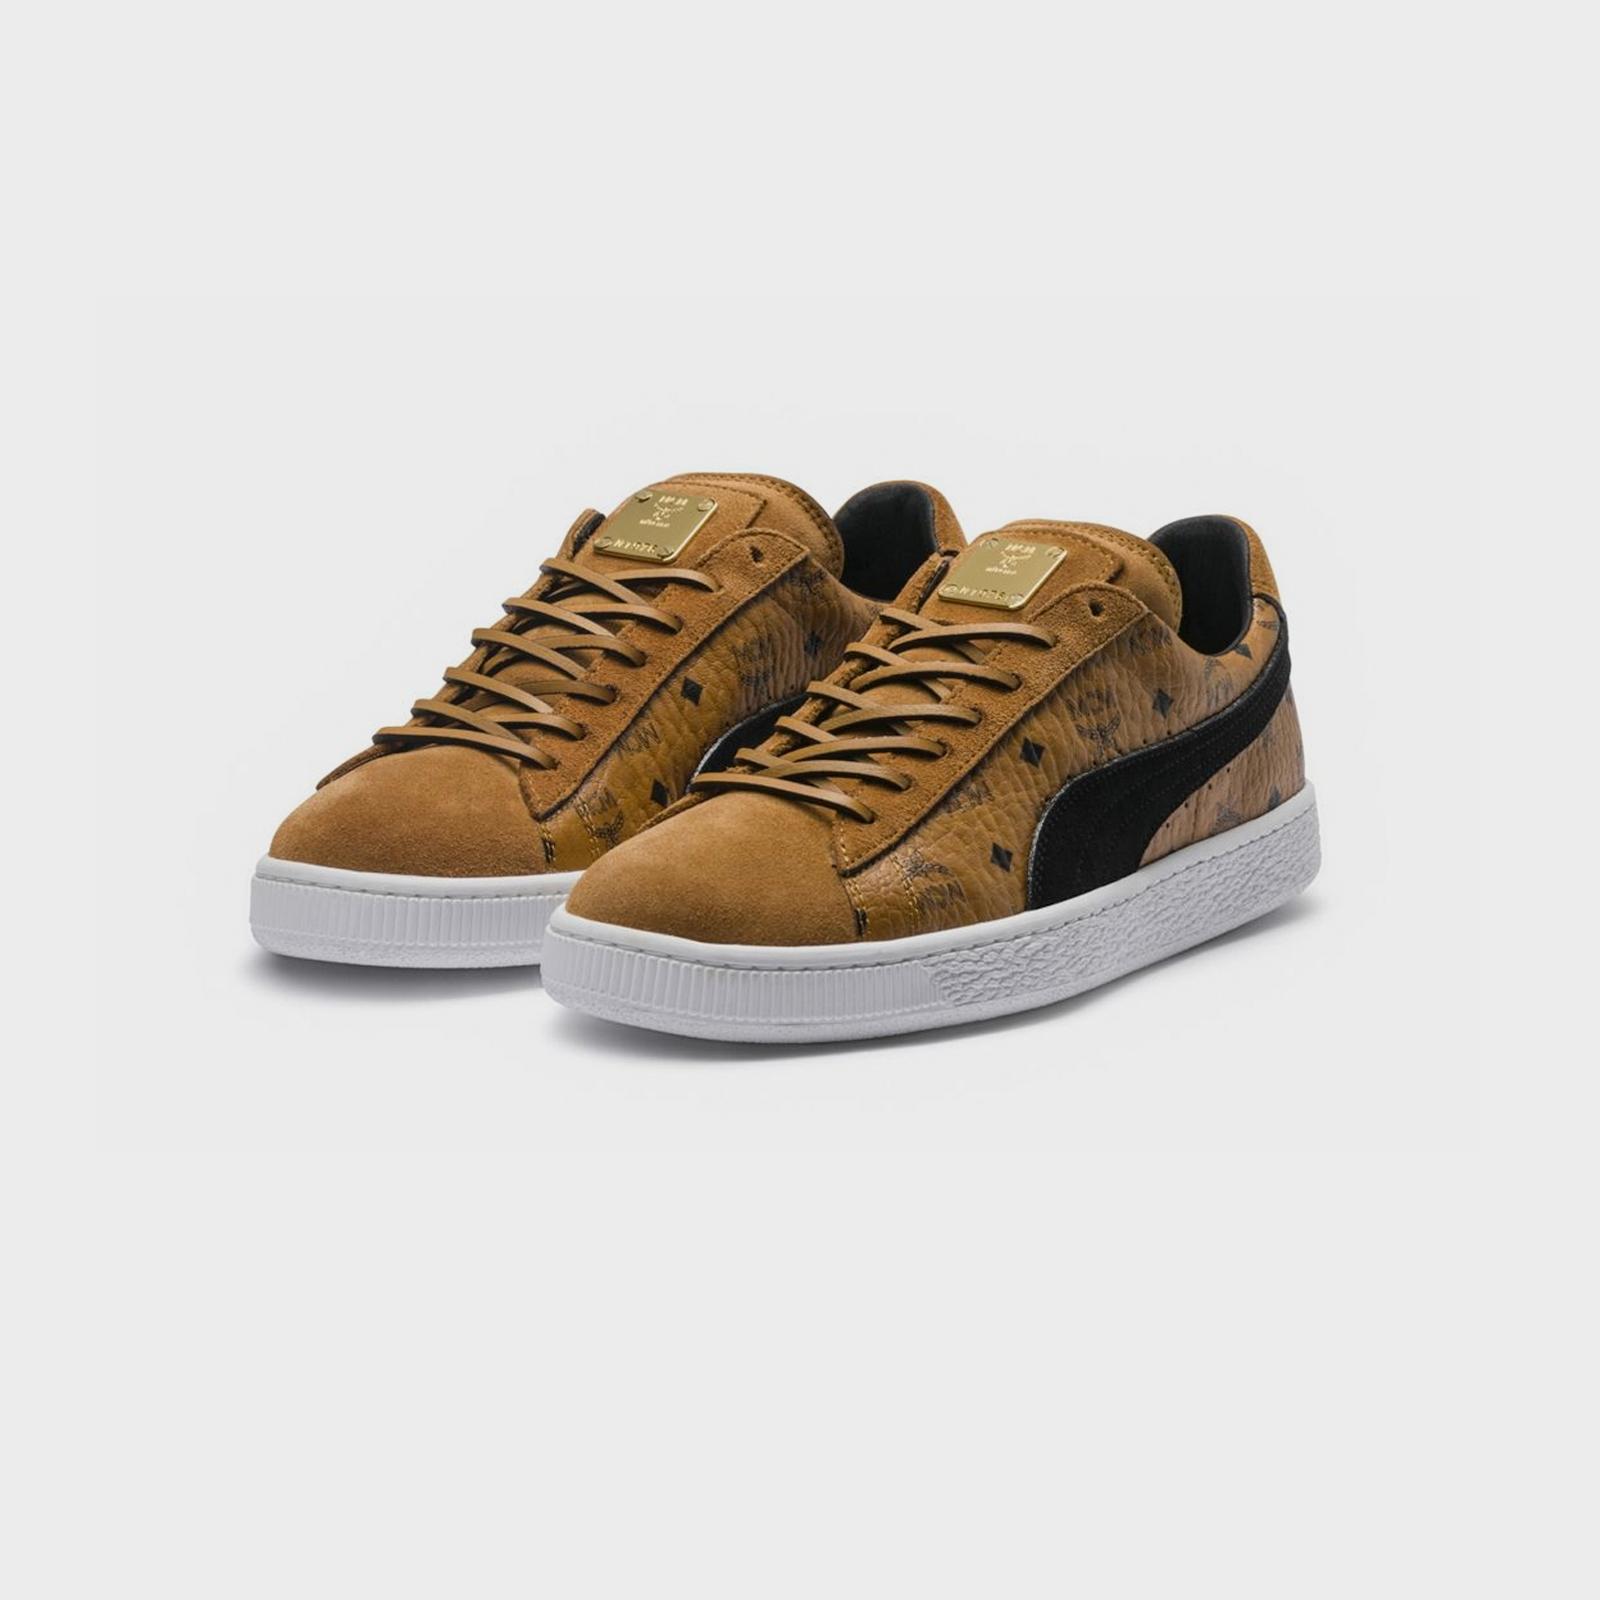 0b0ce611bc204c Puma Suede Classic x MCM - 366299-01 - Sneakersnstuff